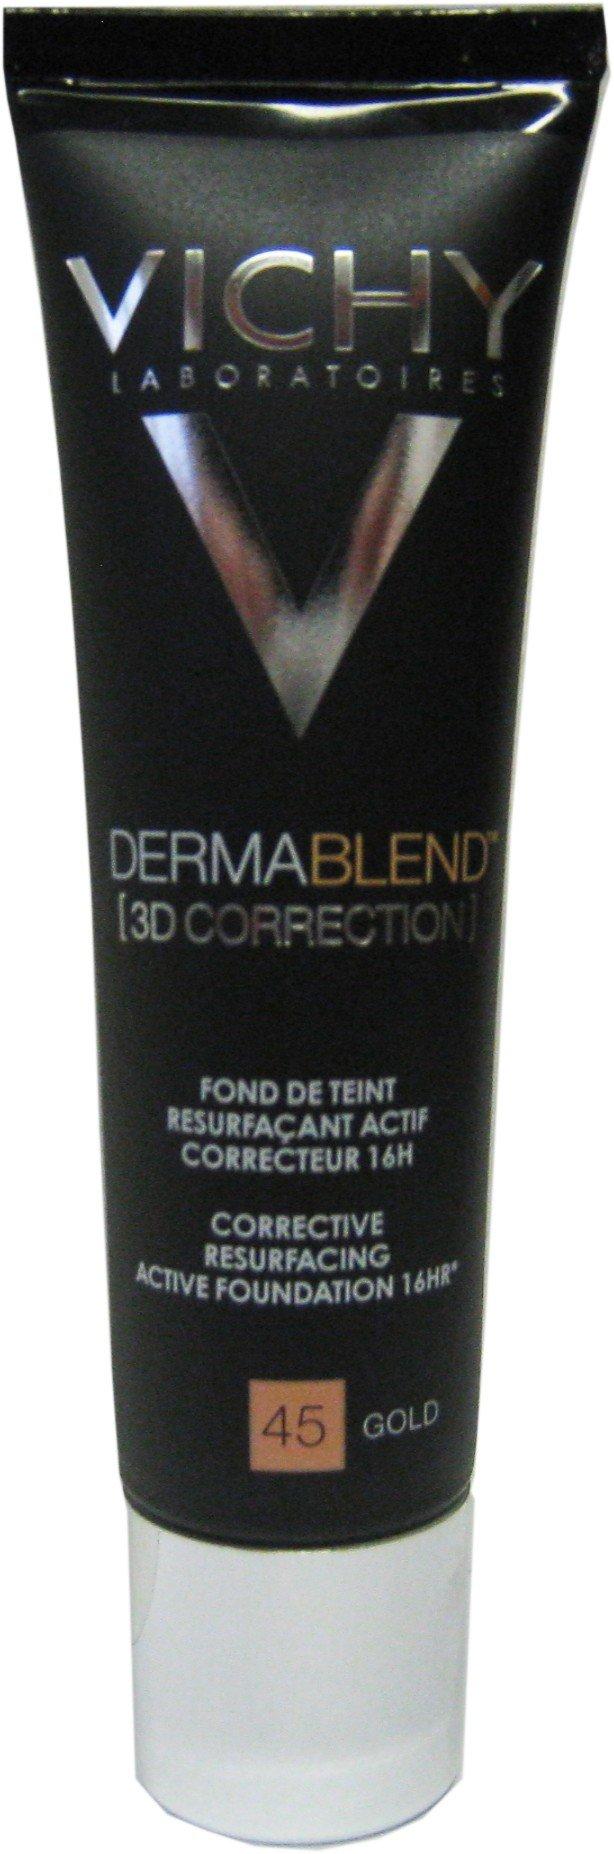 Vichy Dermablend make-up 3D korekcia 45 gold 30 ml